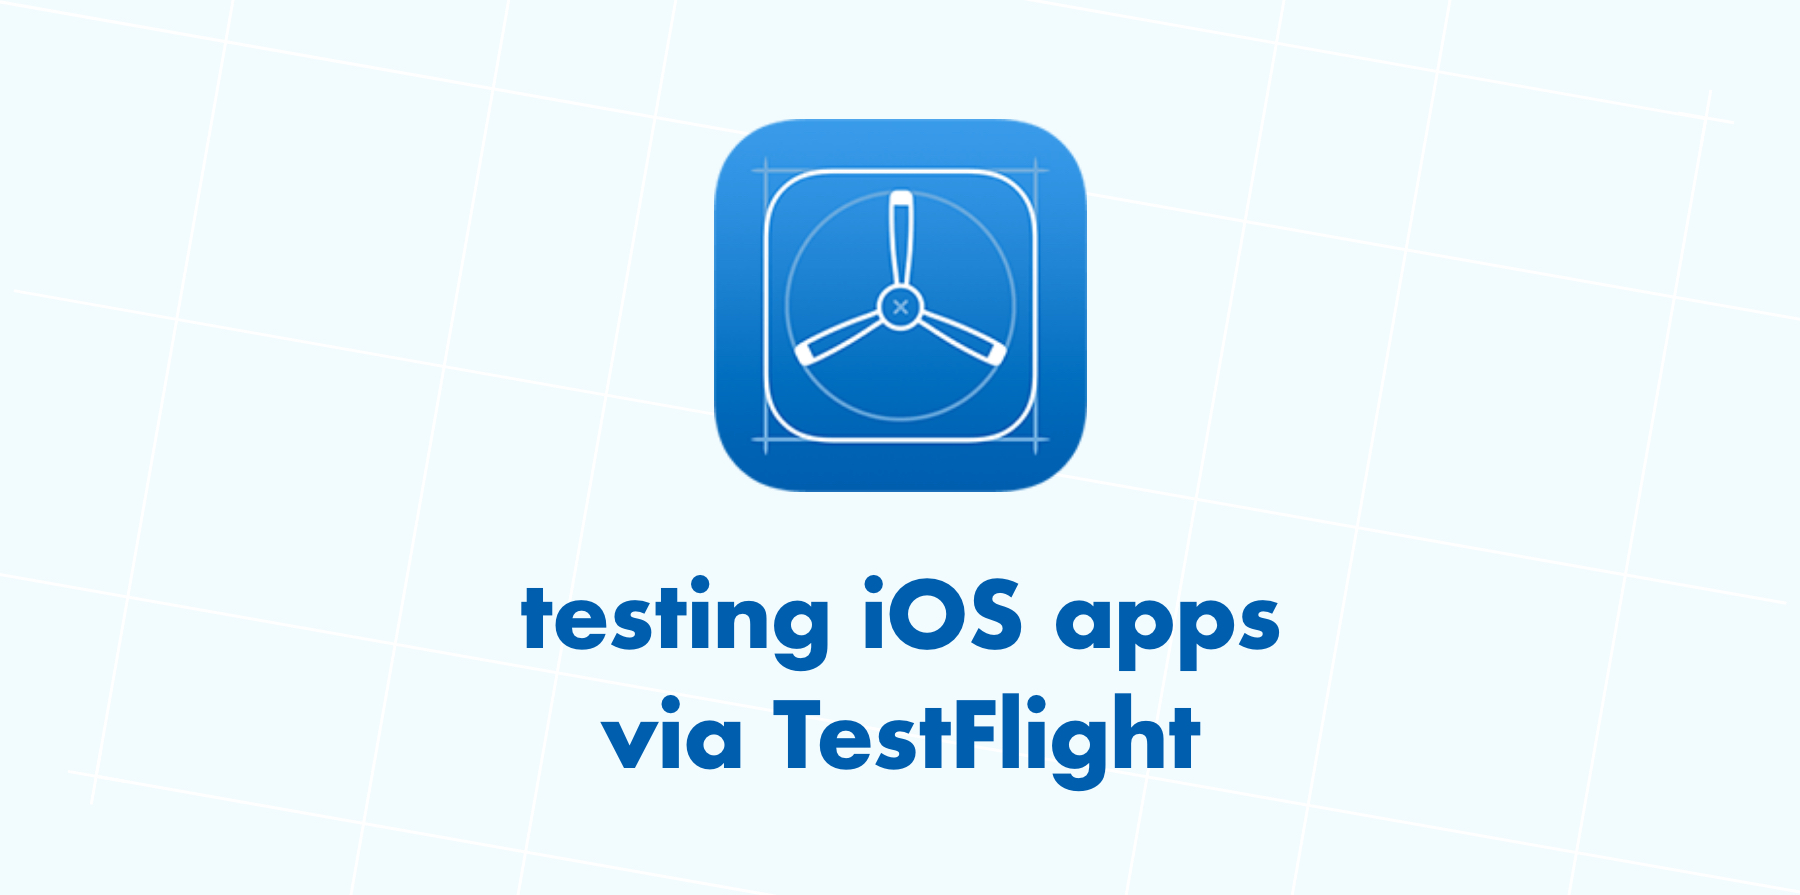 Testing iOS Apps via TestFlight Image